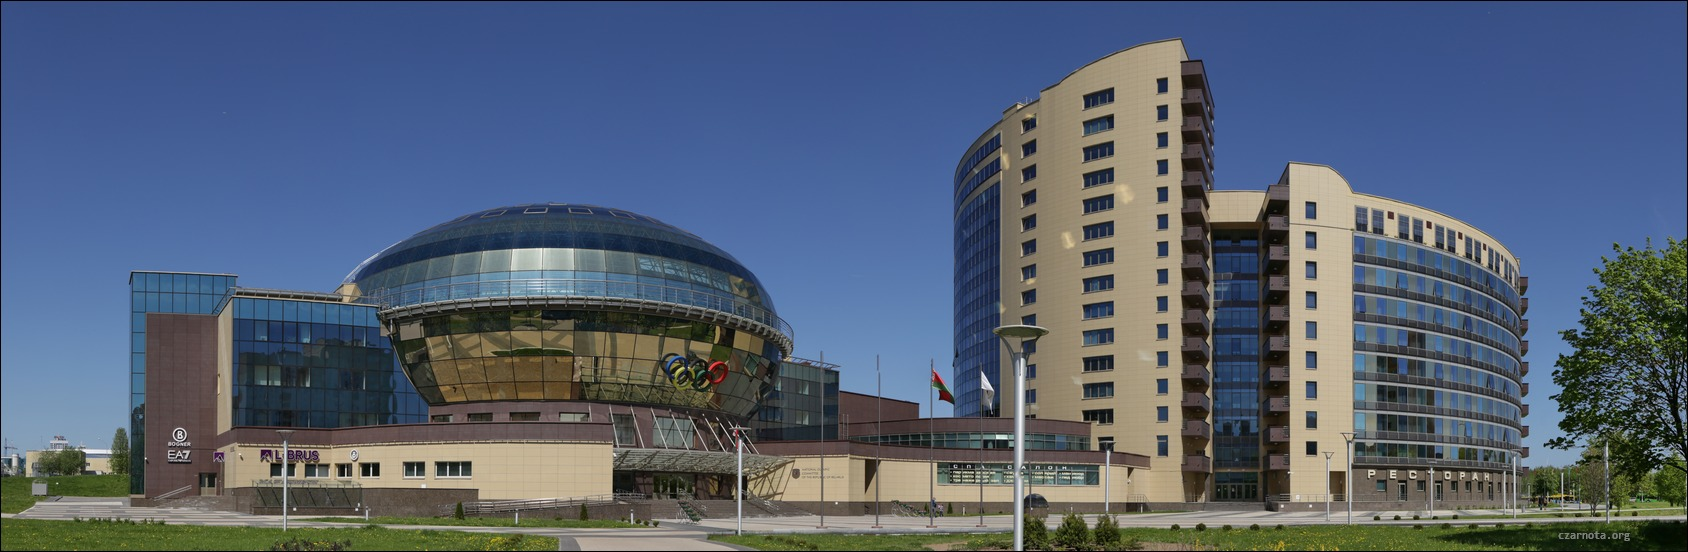 Olympic casino belarus